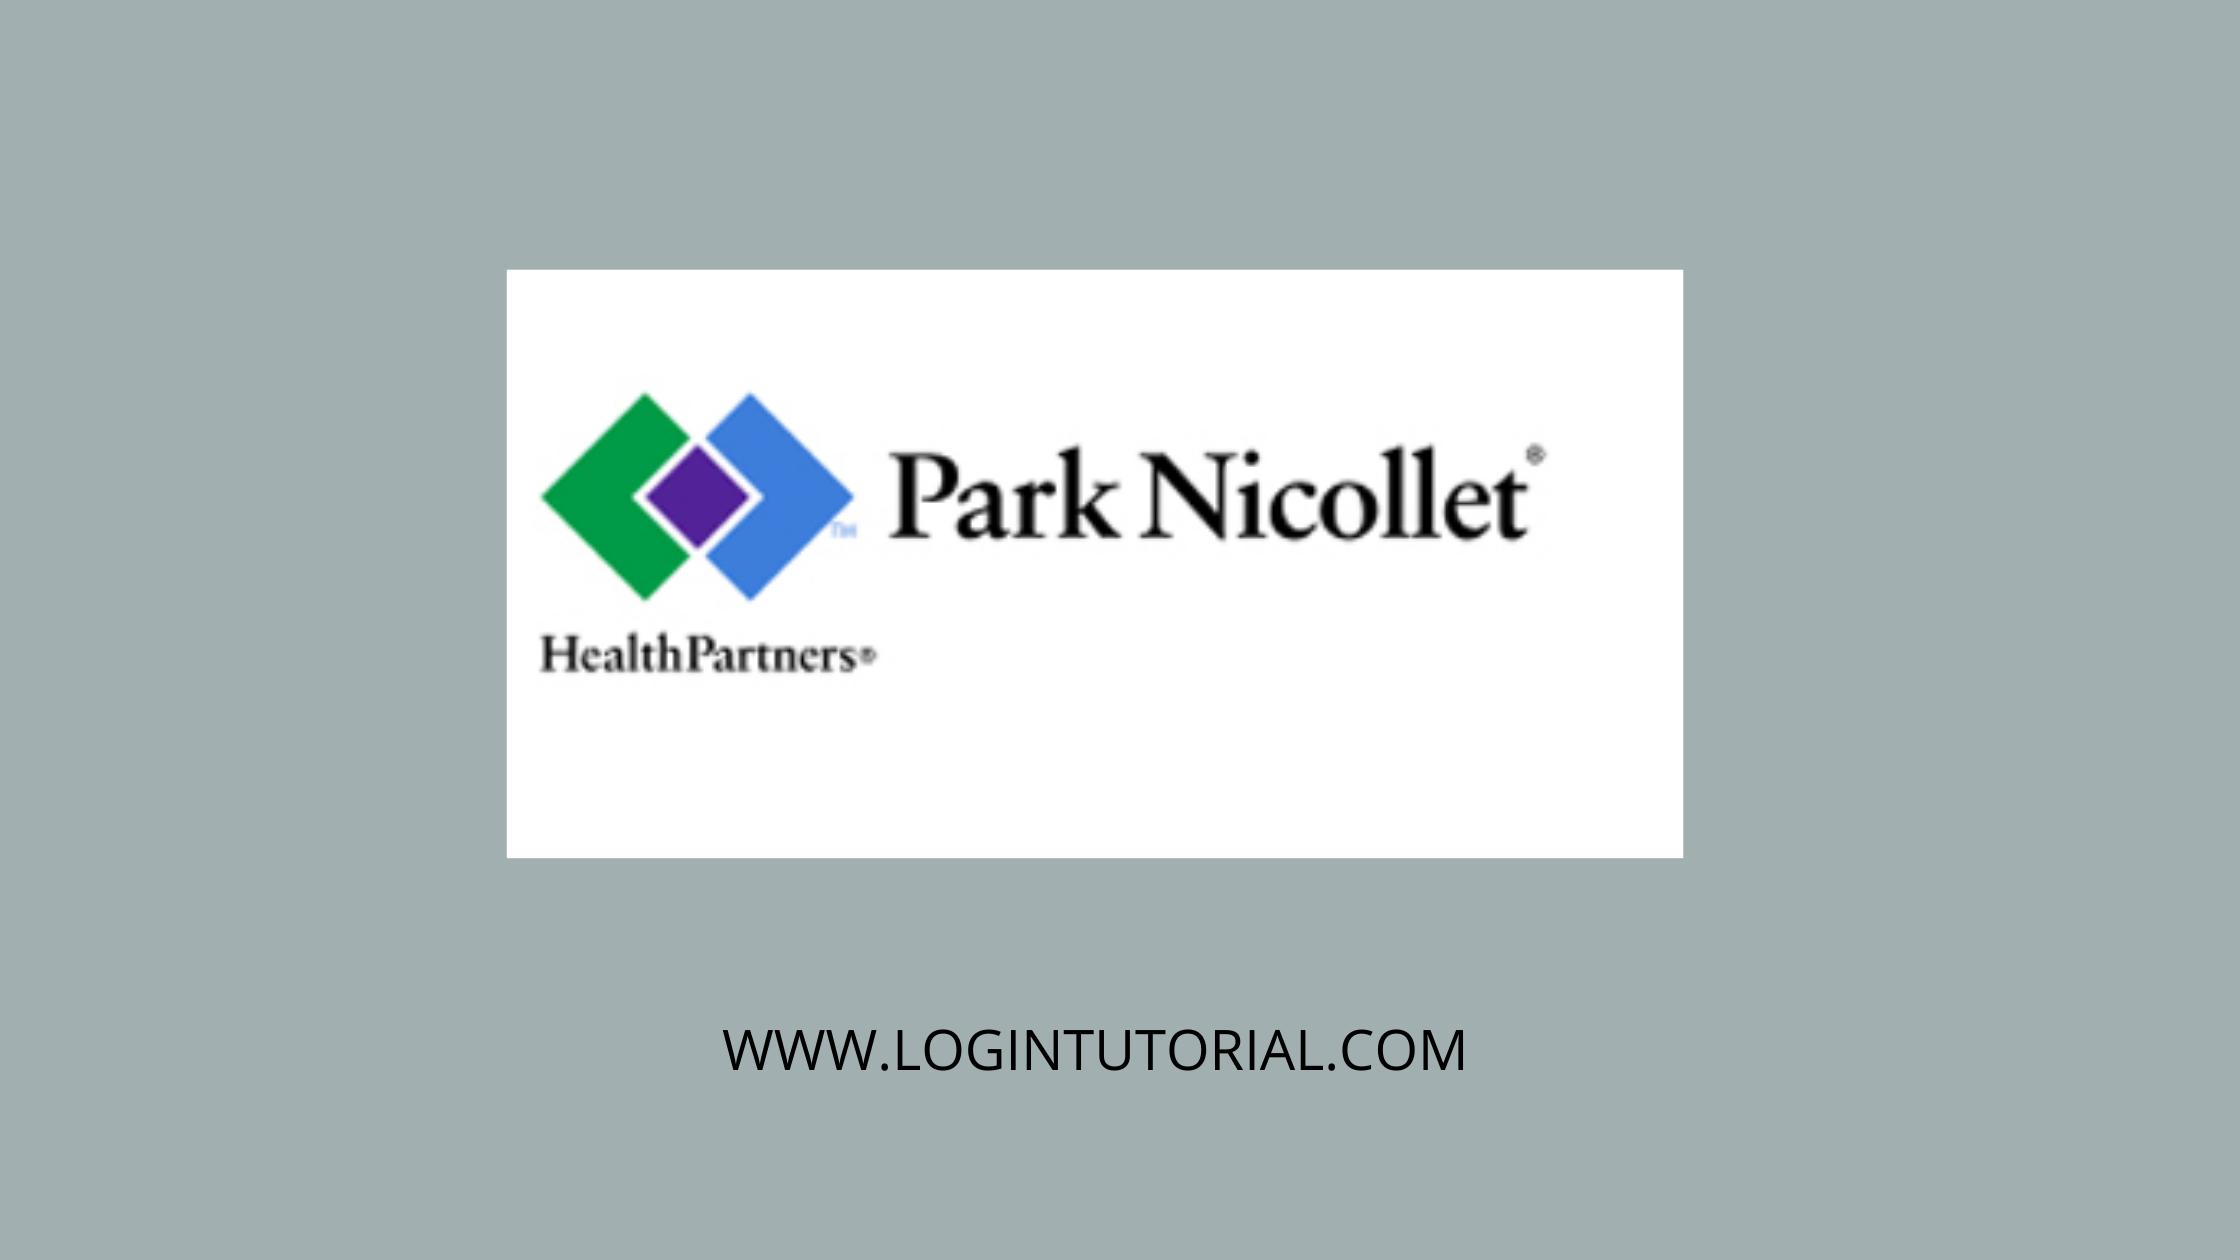 Park Nicollet MyChart: Overview & Guideline